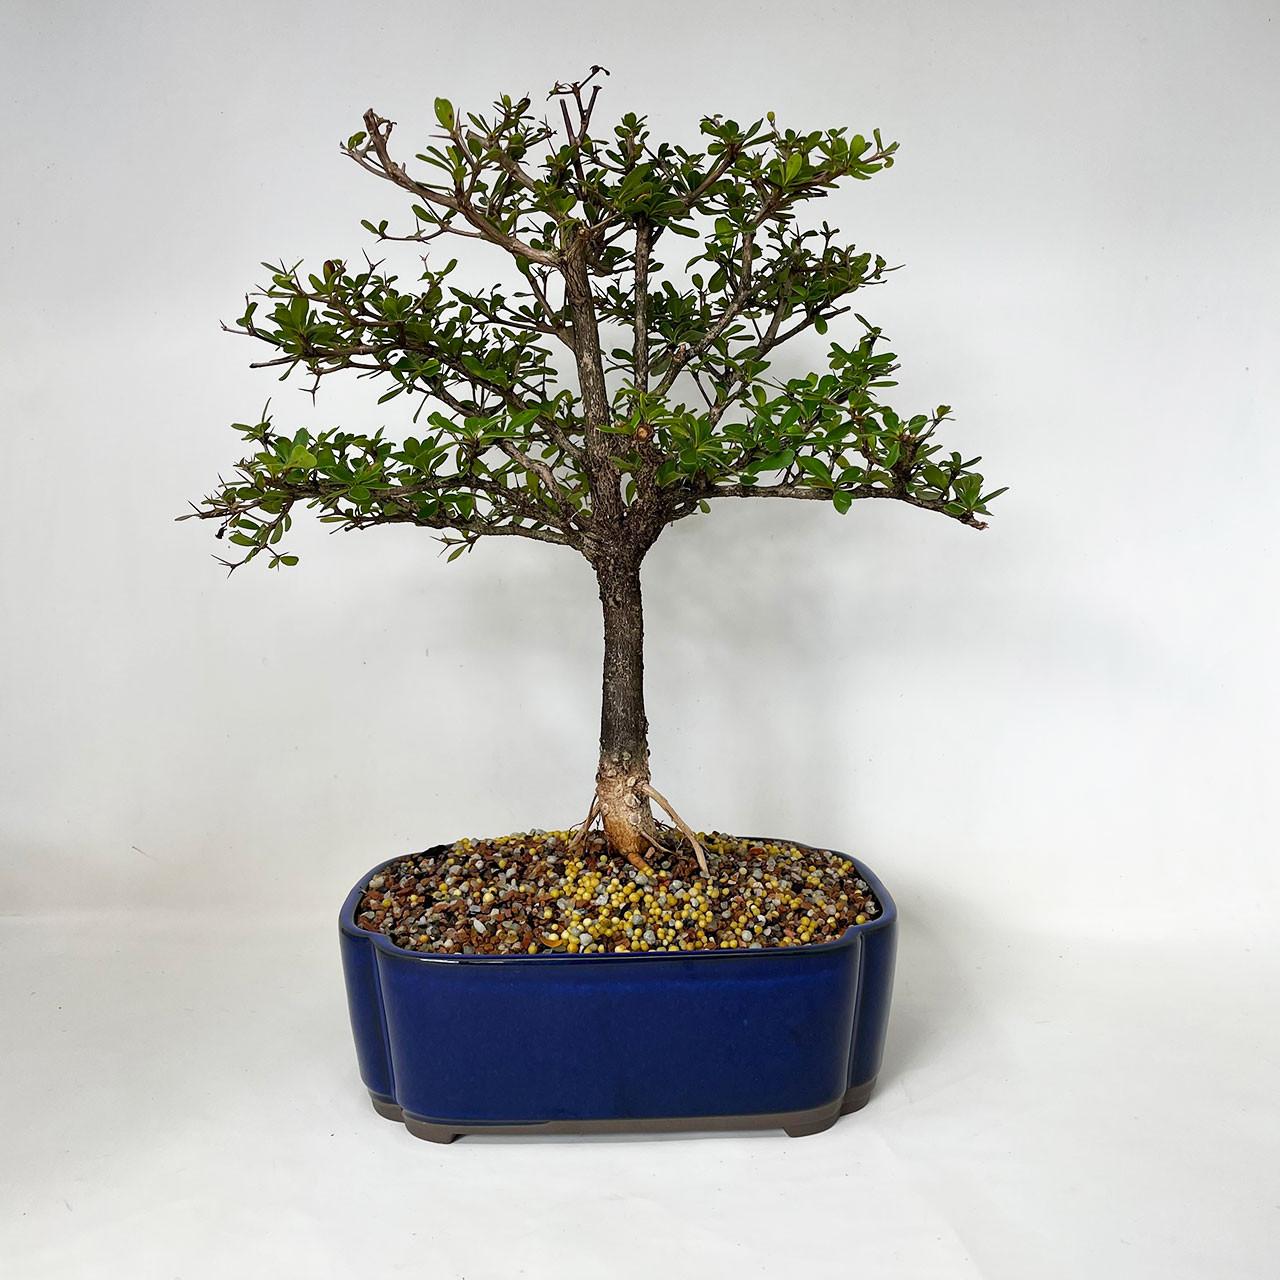 Black Olive Bonsai Tree Bonsai Outlet Tweblbo 01